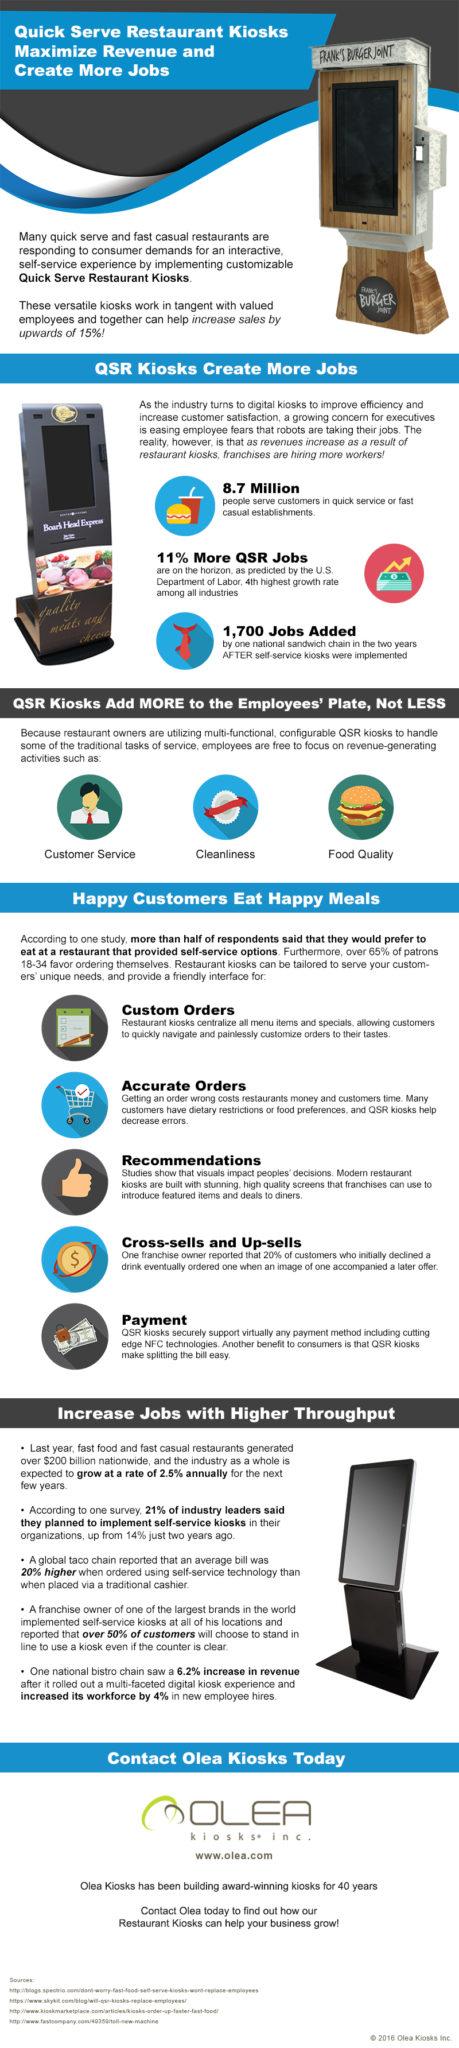 Restaurant Kiosks Maximize Revenue and Create More Jobs